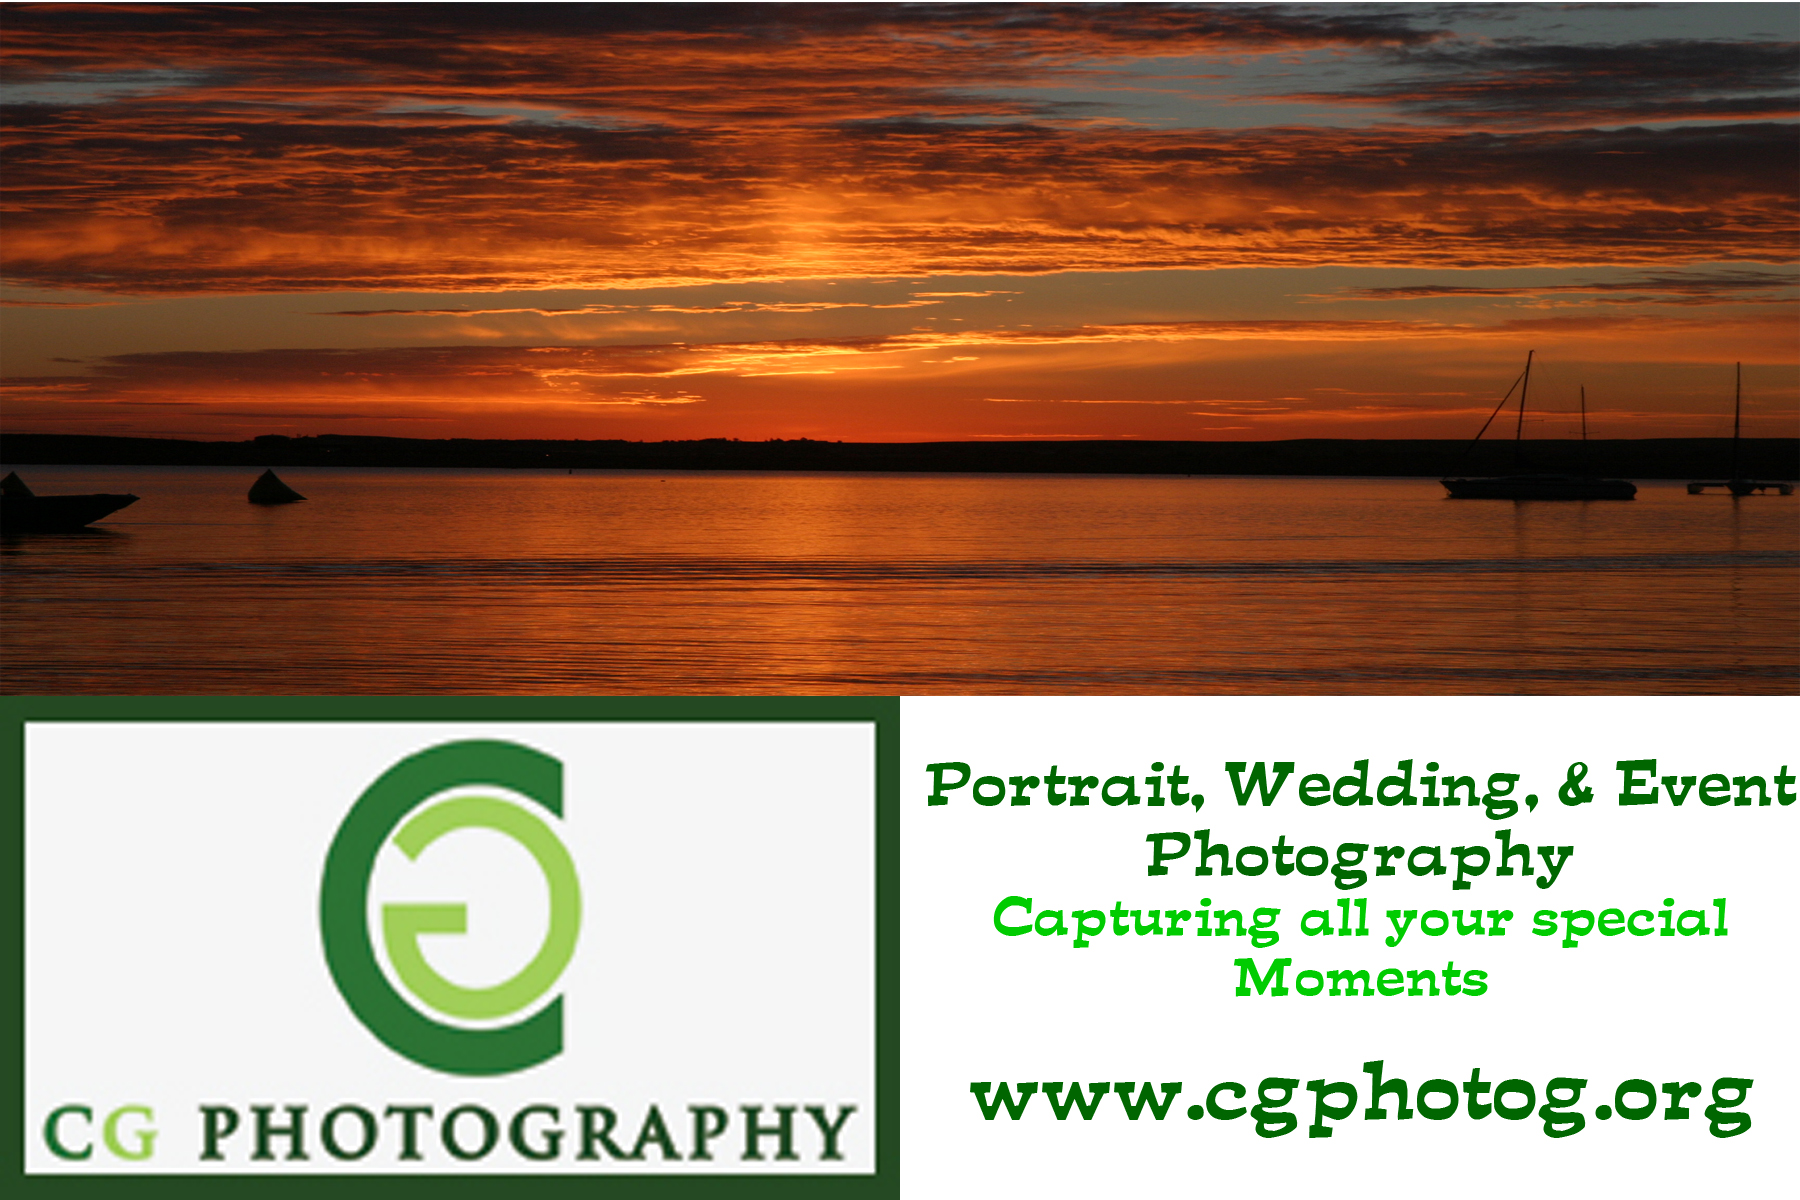 CG Photography